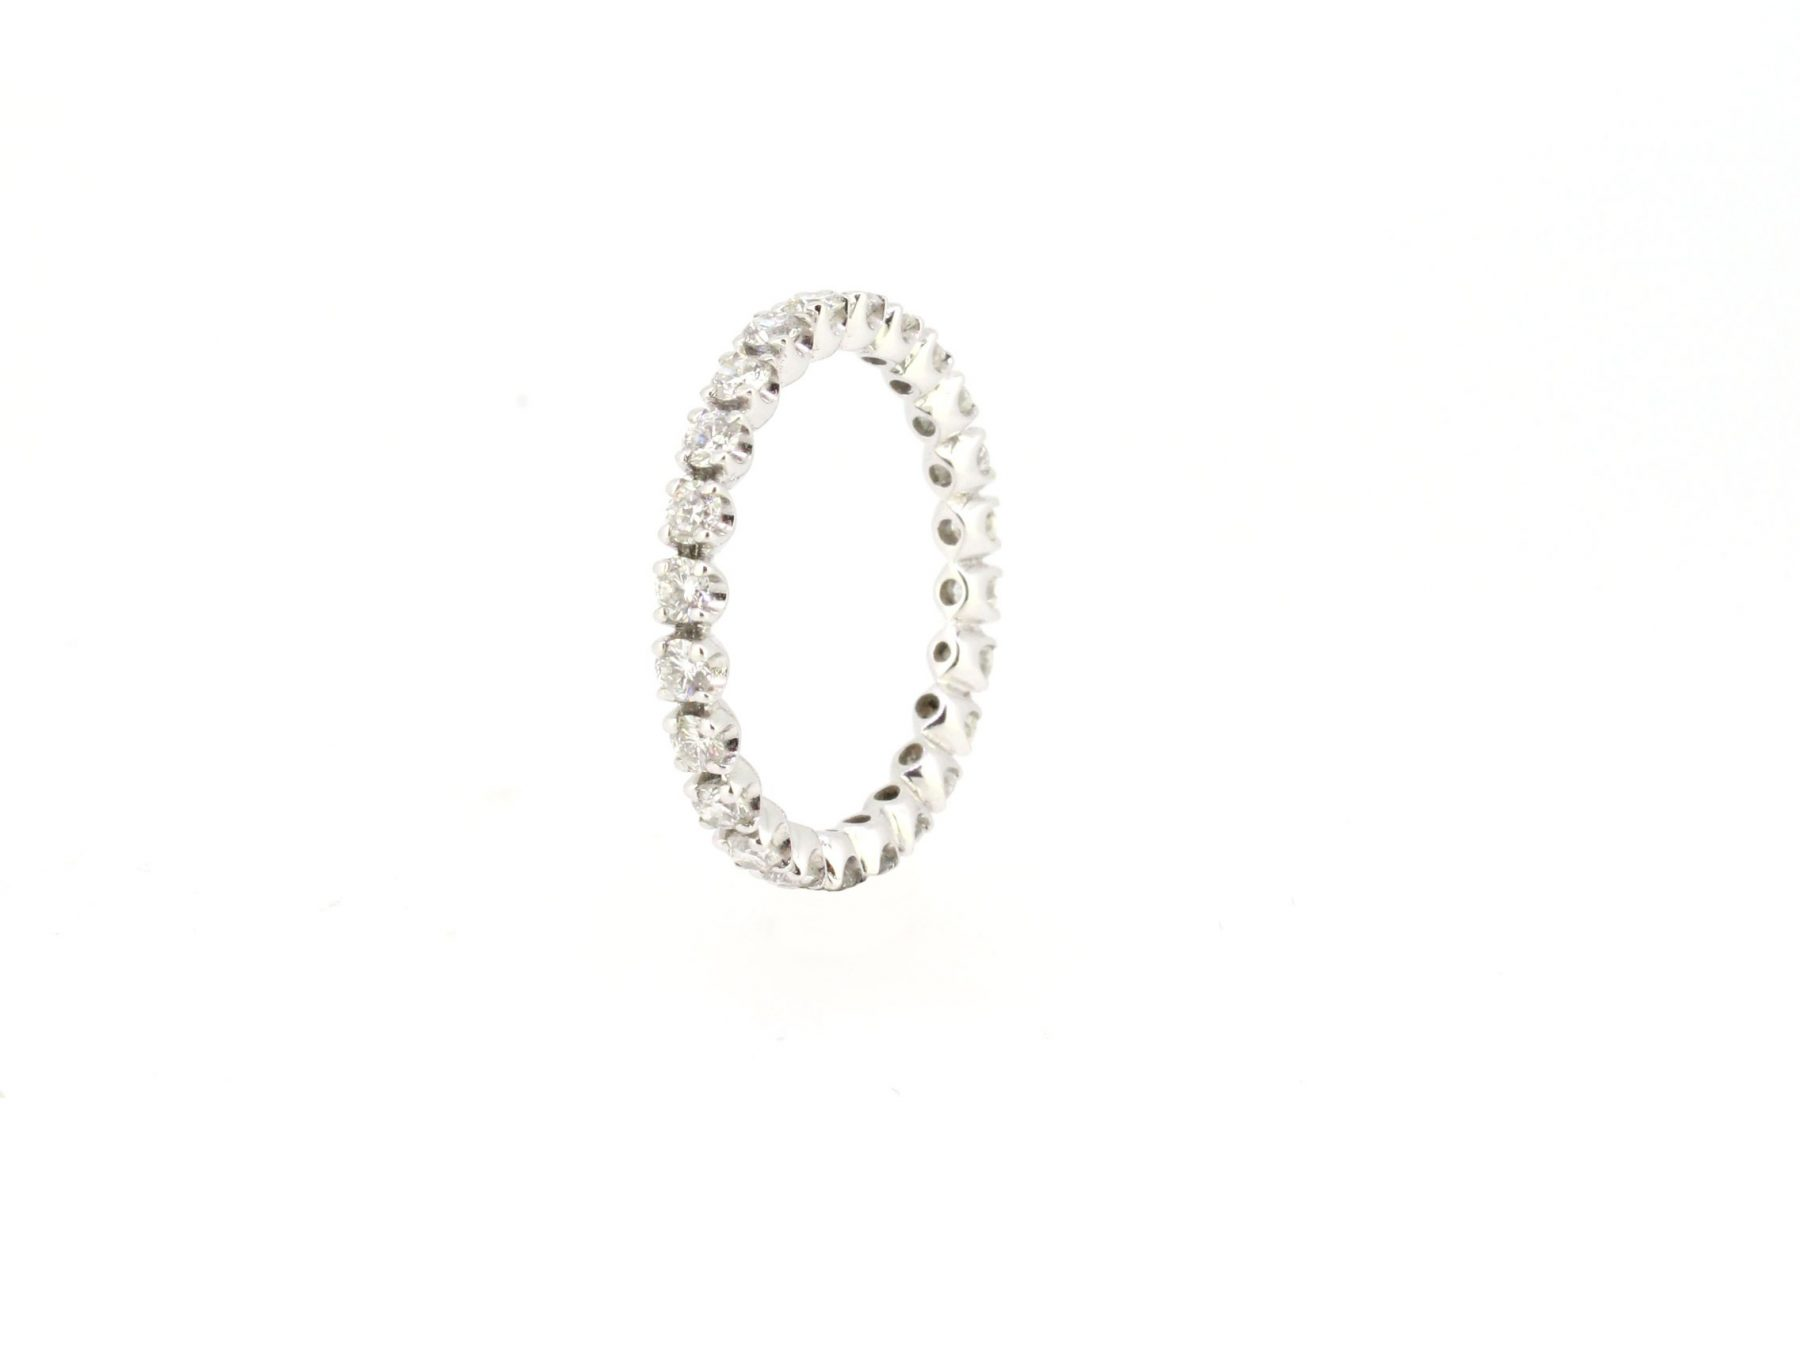 Ring Memory 18ct Weißgold - GalerieVoigt - 10111WG